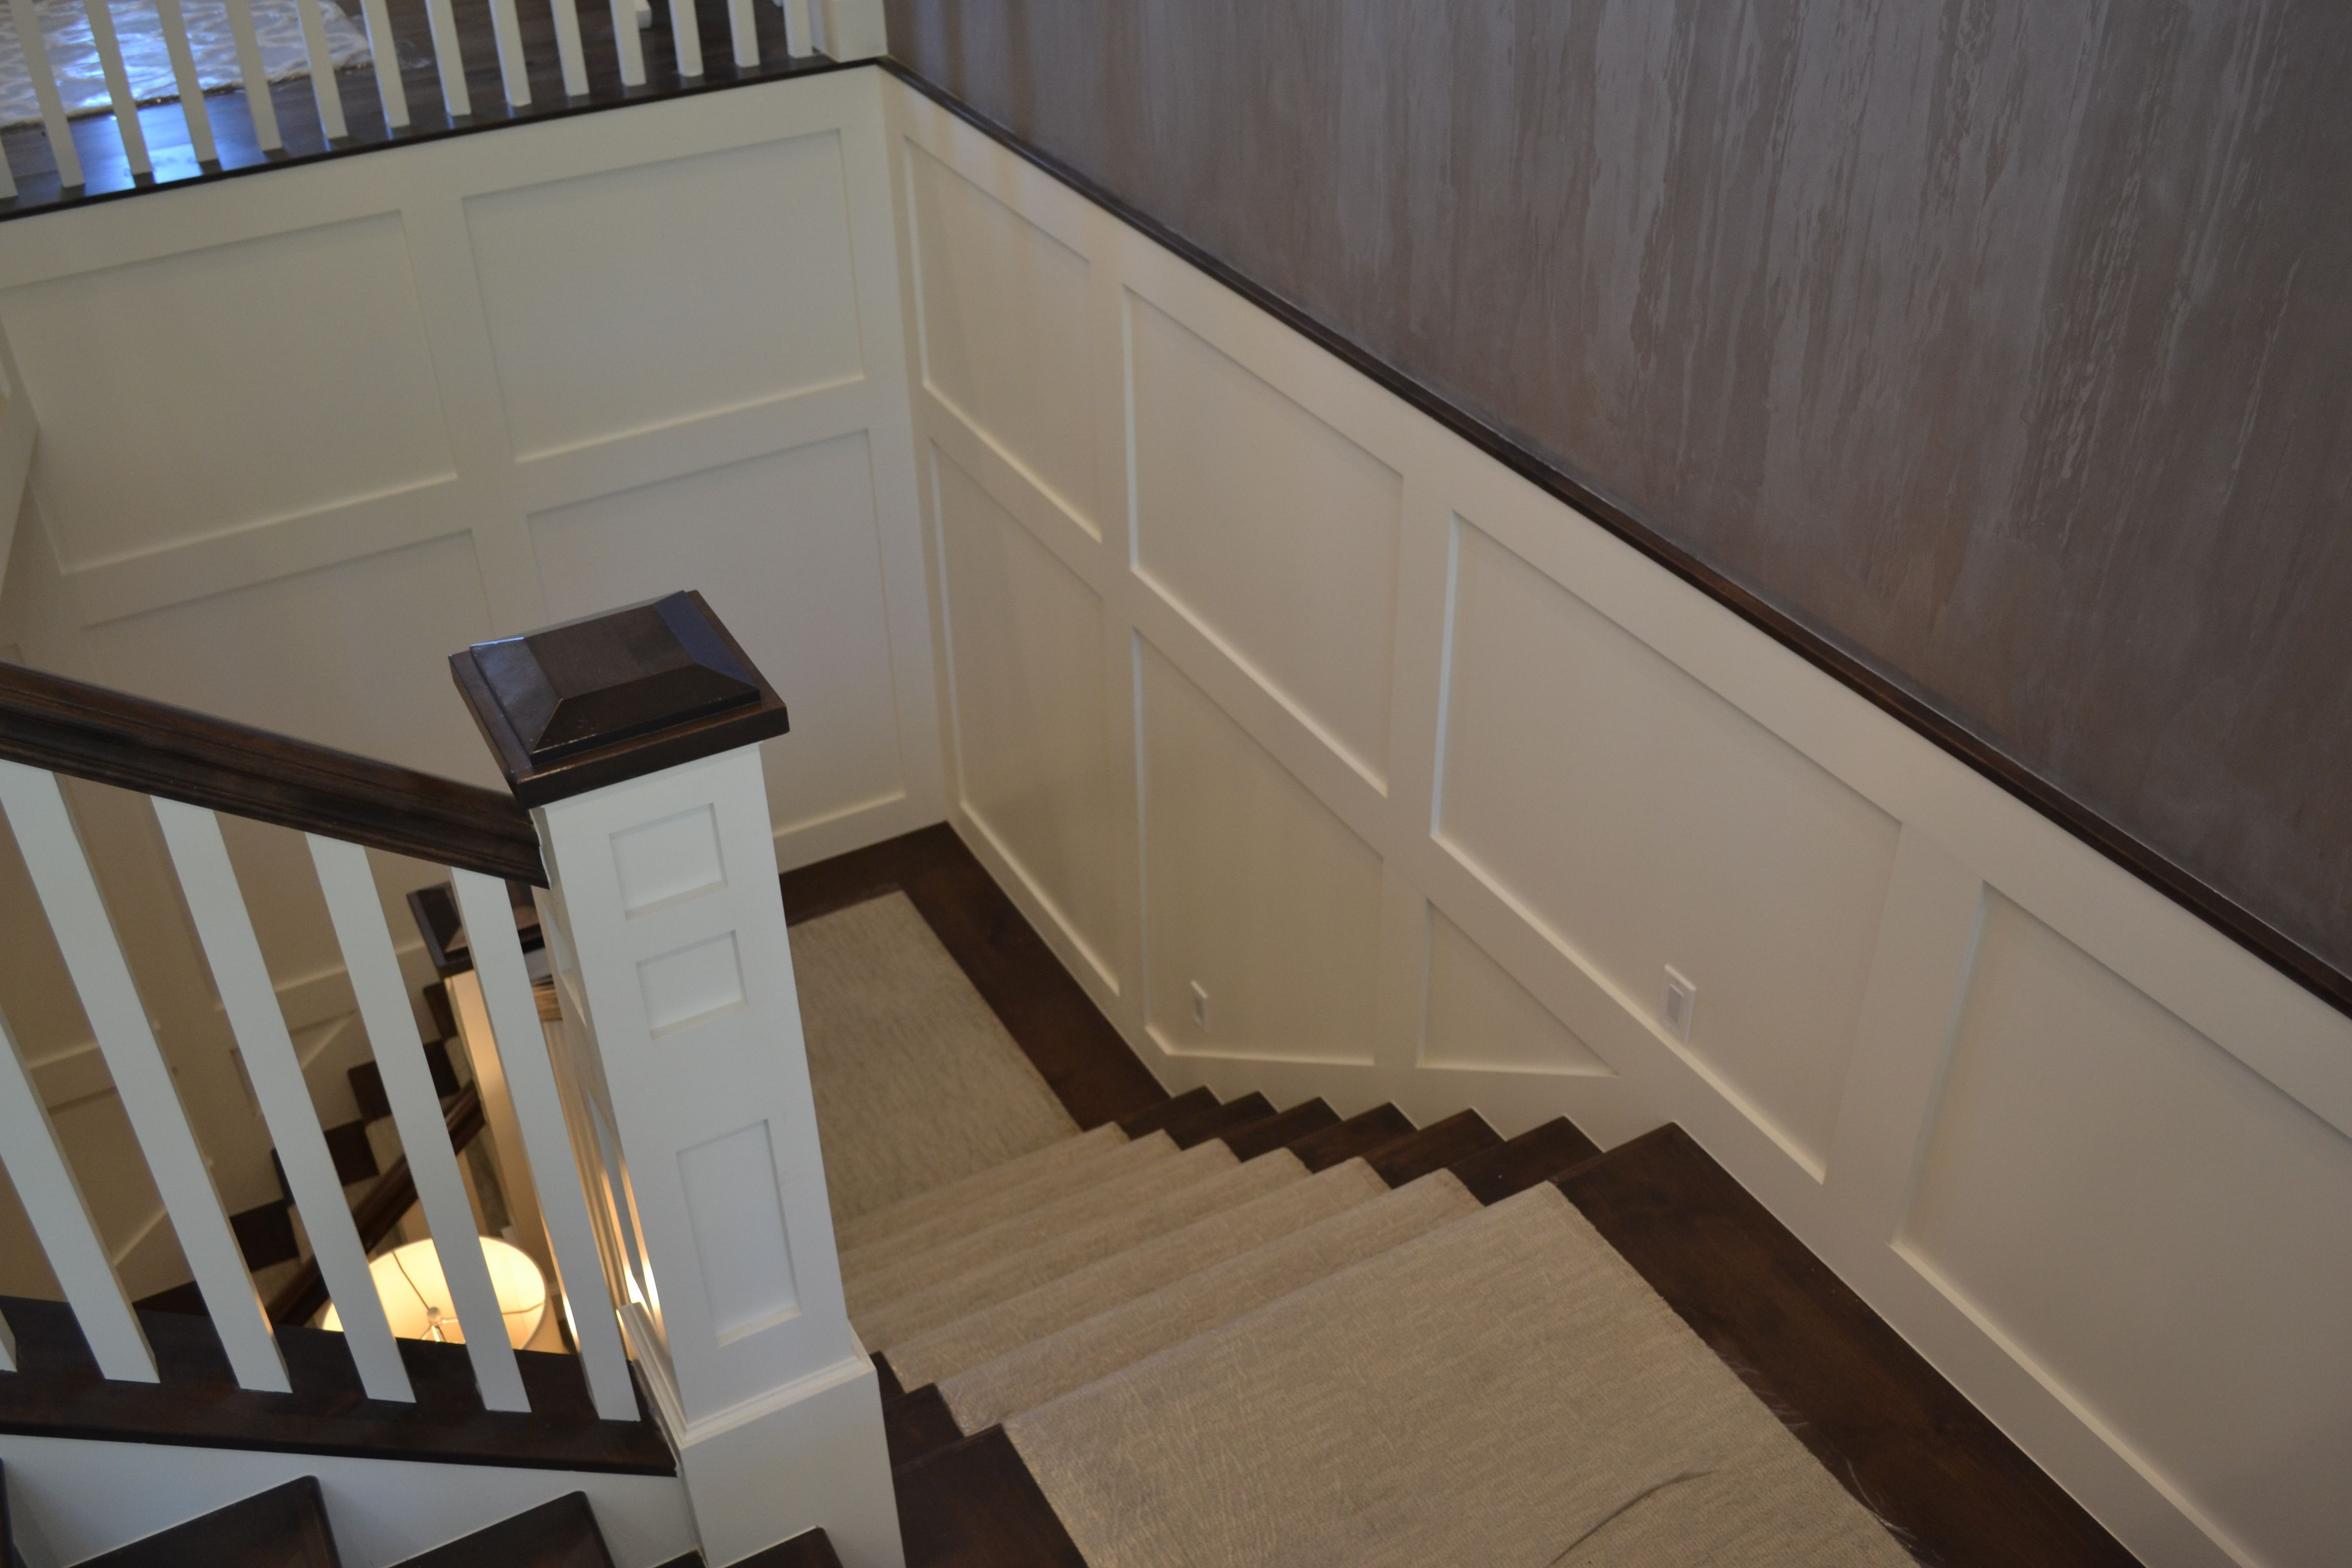 Paneled Walls, Railings, Stairs, Stairways, Ladder, Staircases, Stiles,  Stairway, Banisters